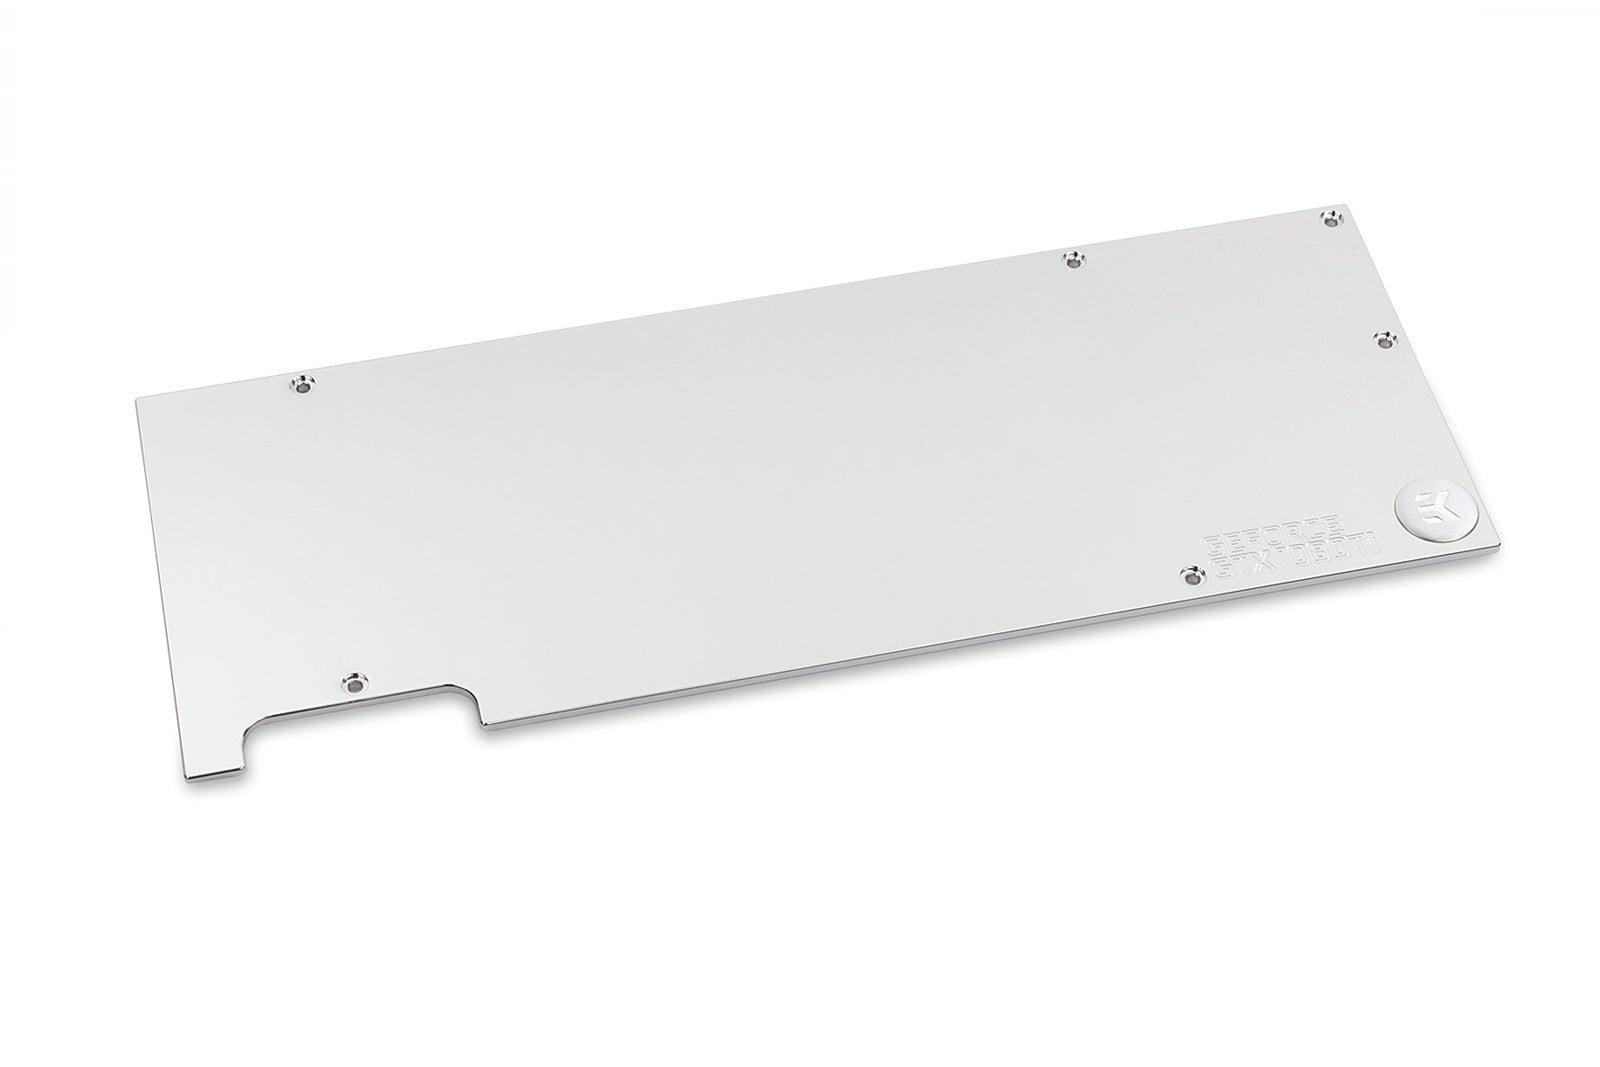 EK-FC1080 GTX Ti  (and FE) Backplate - Nickel